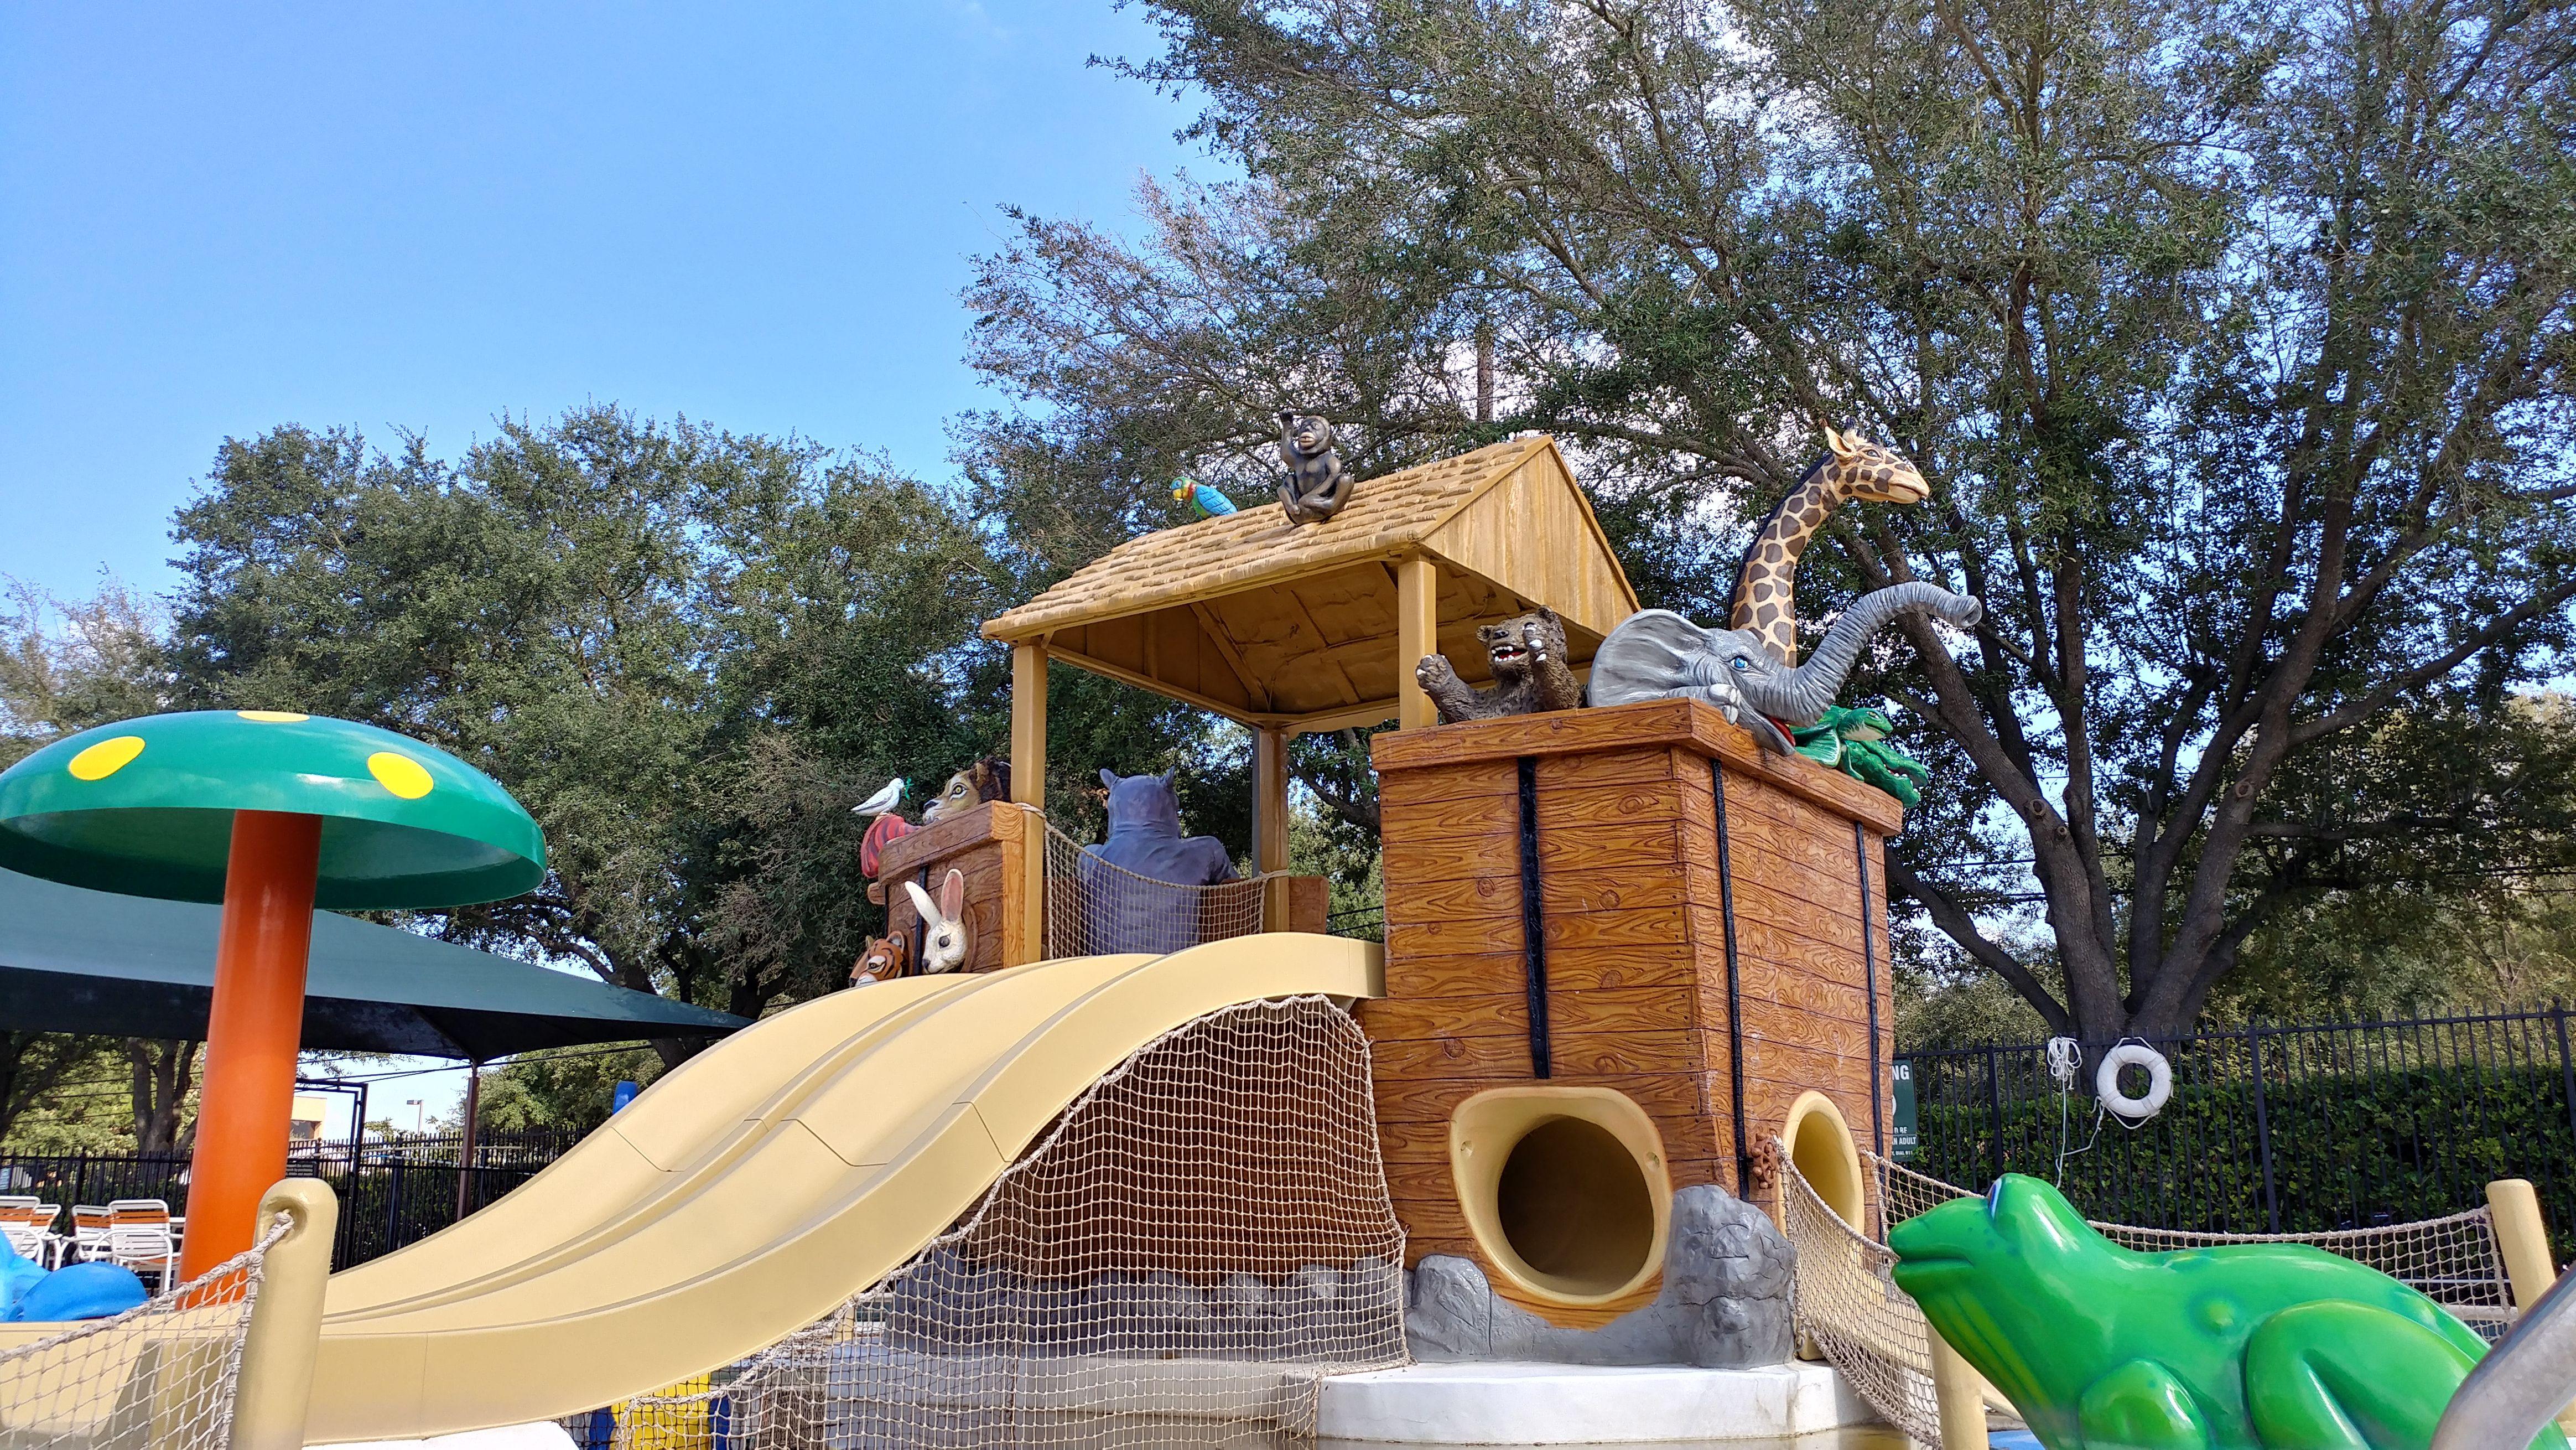 Noah's Ark Pool, Houston